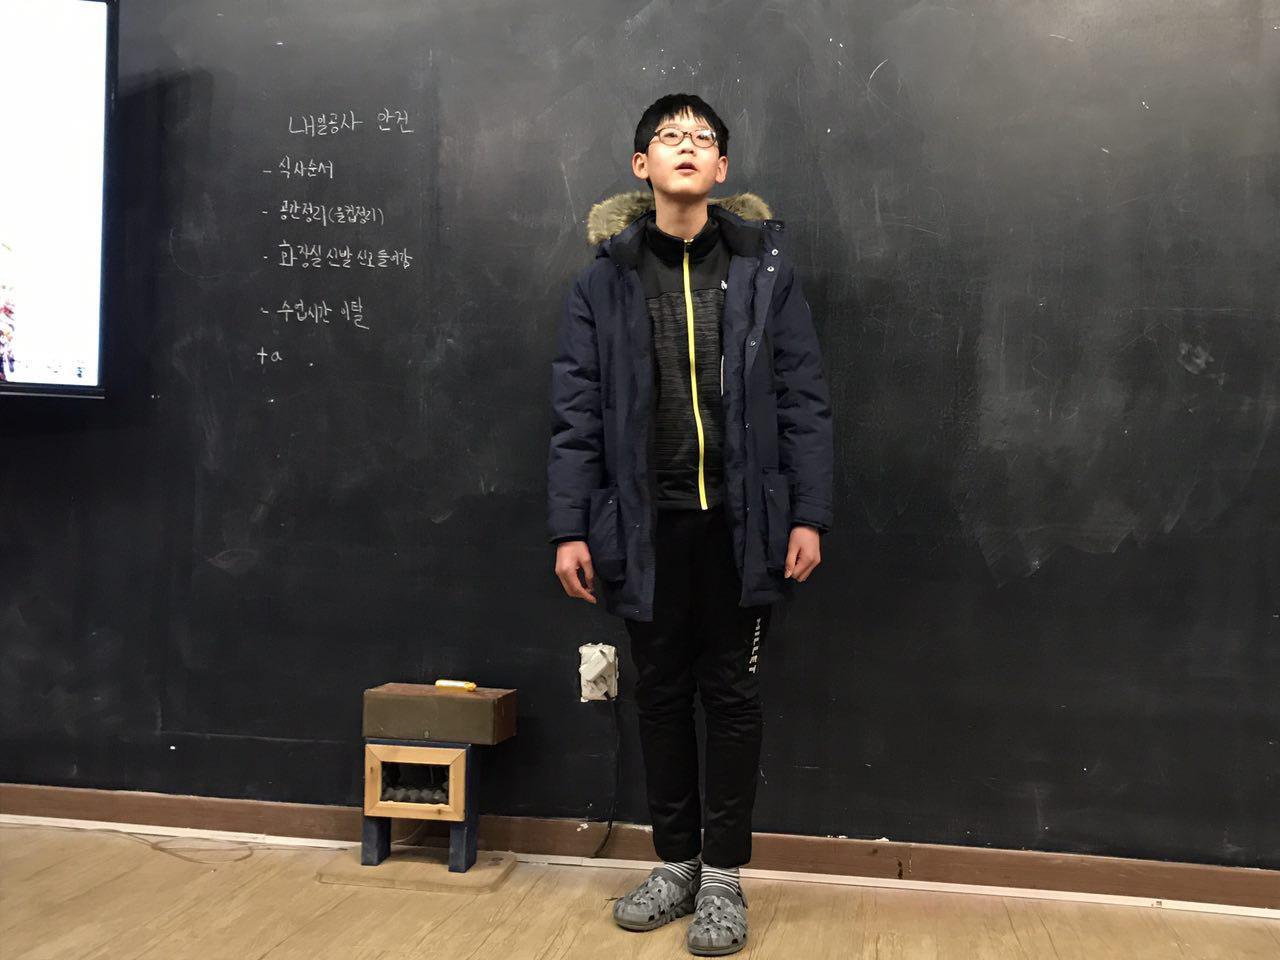 photo_2018-01-25_17-54-19 (2).jpg